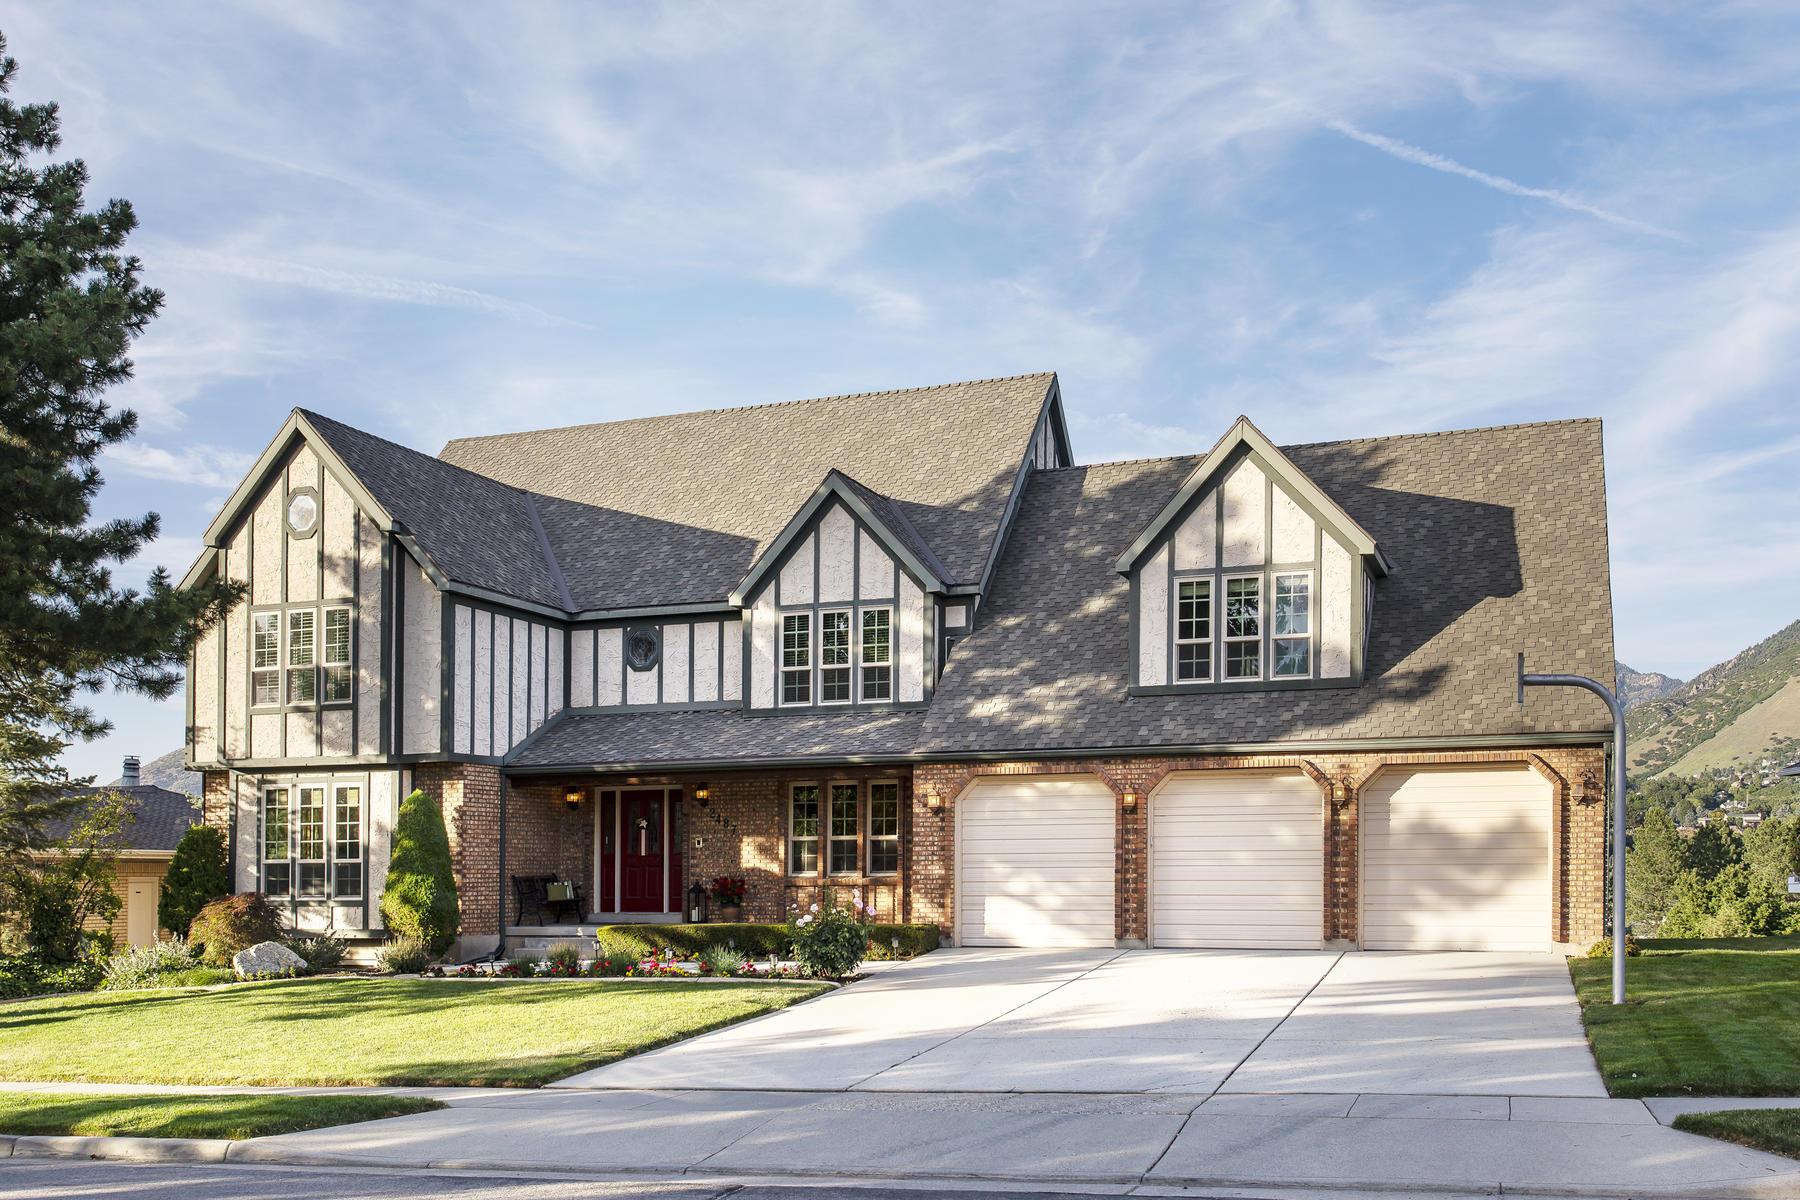 Single Family Homes için Satış at Fantastic Willow Creek Opportunity 2487 E Barcelona Dr, Sandy, Utah 84093 Amerika Birleşik Devletleri